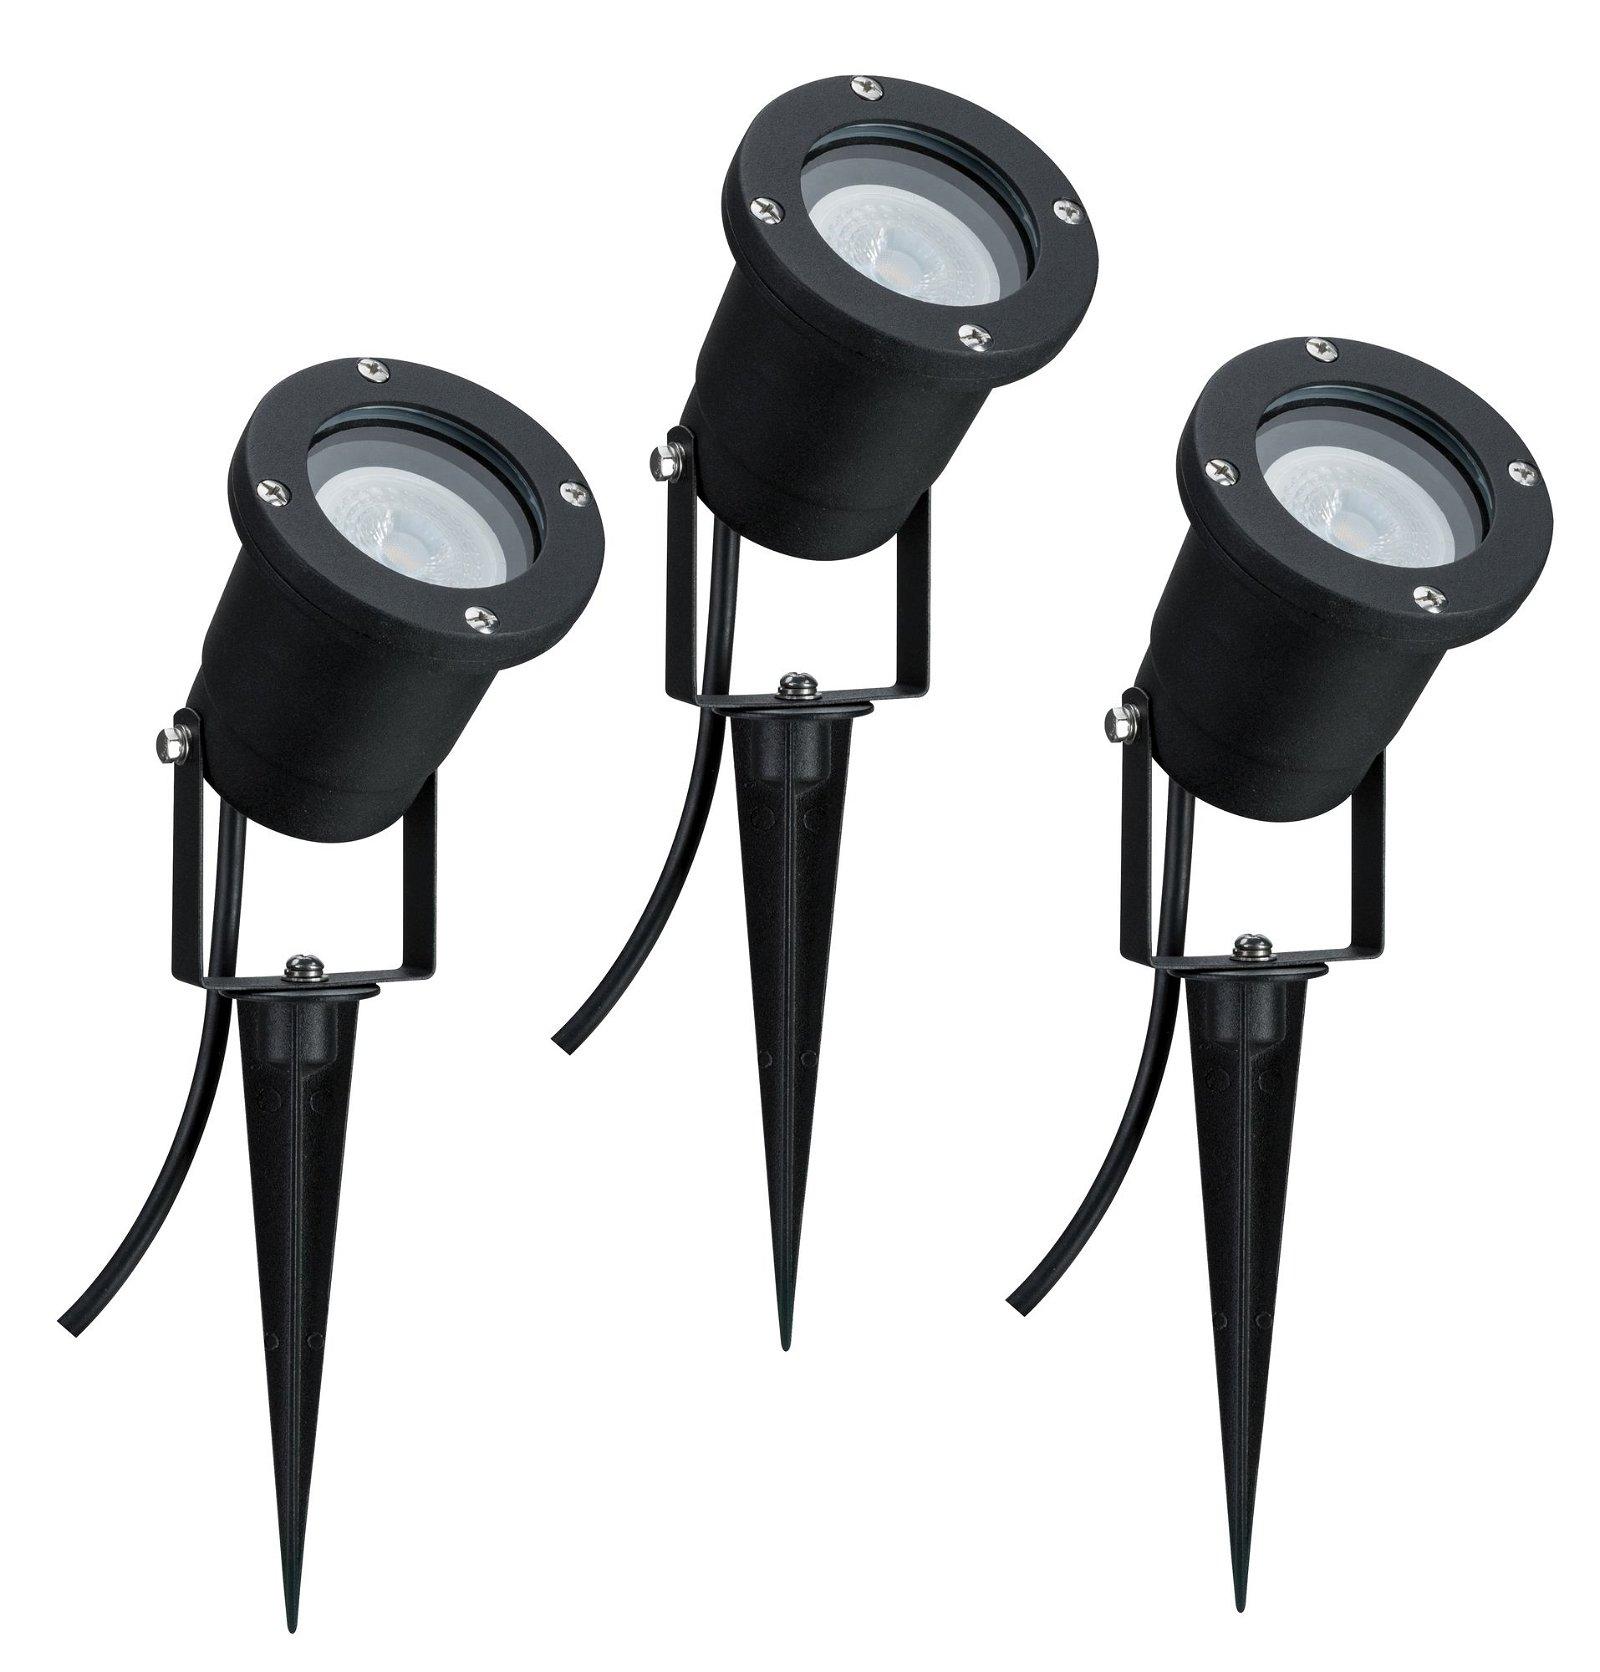 Special Line Projecteur de jardin IP65 rond 92mm 3x3,5W 230V Noir Alu